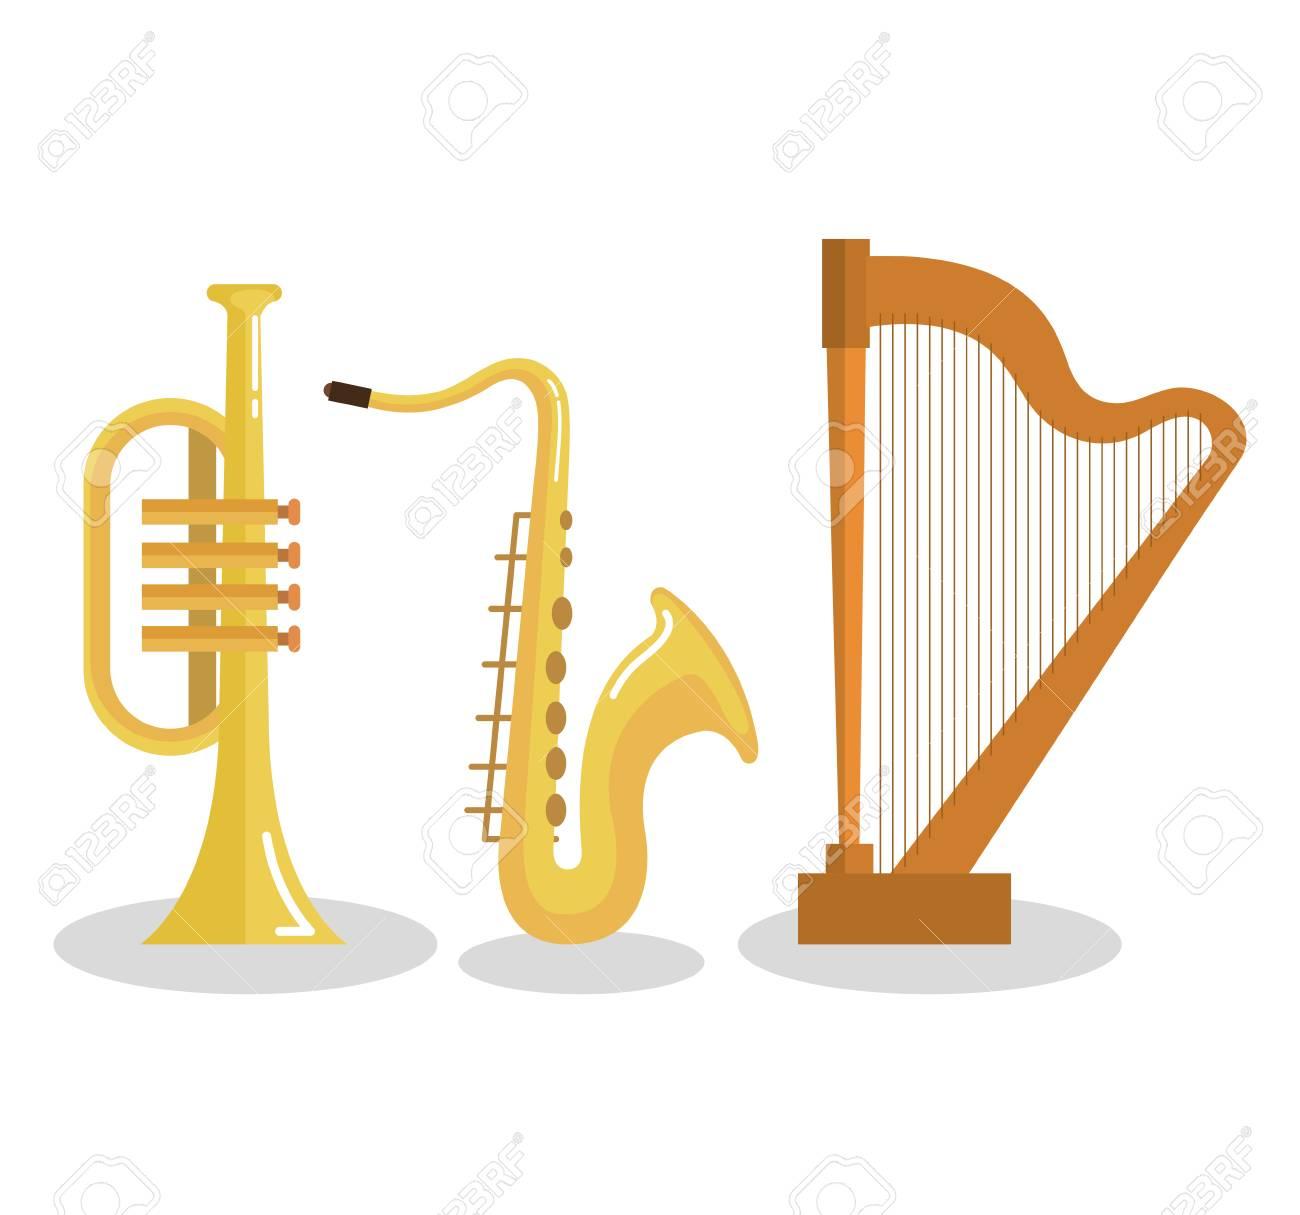 Set Of Musical Instruments Event Symbols Vector Illustration Royalty